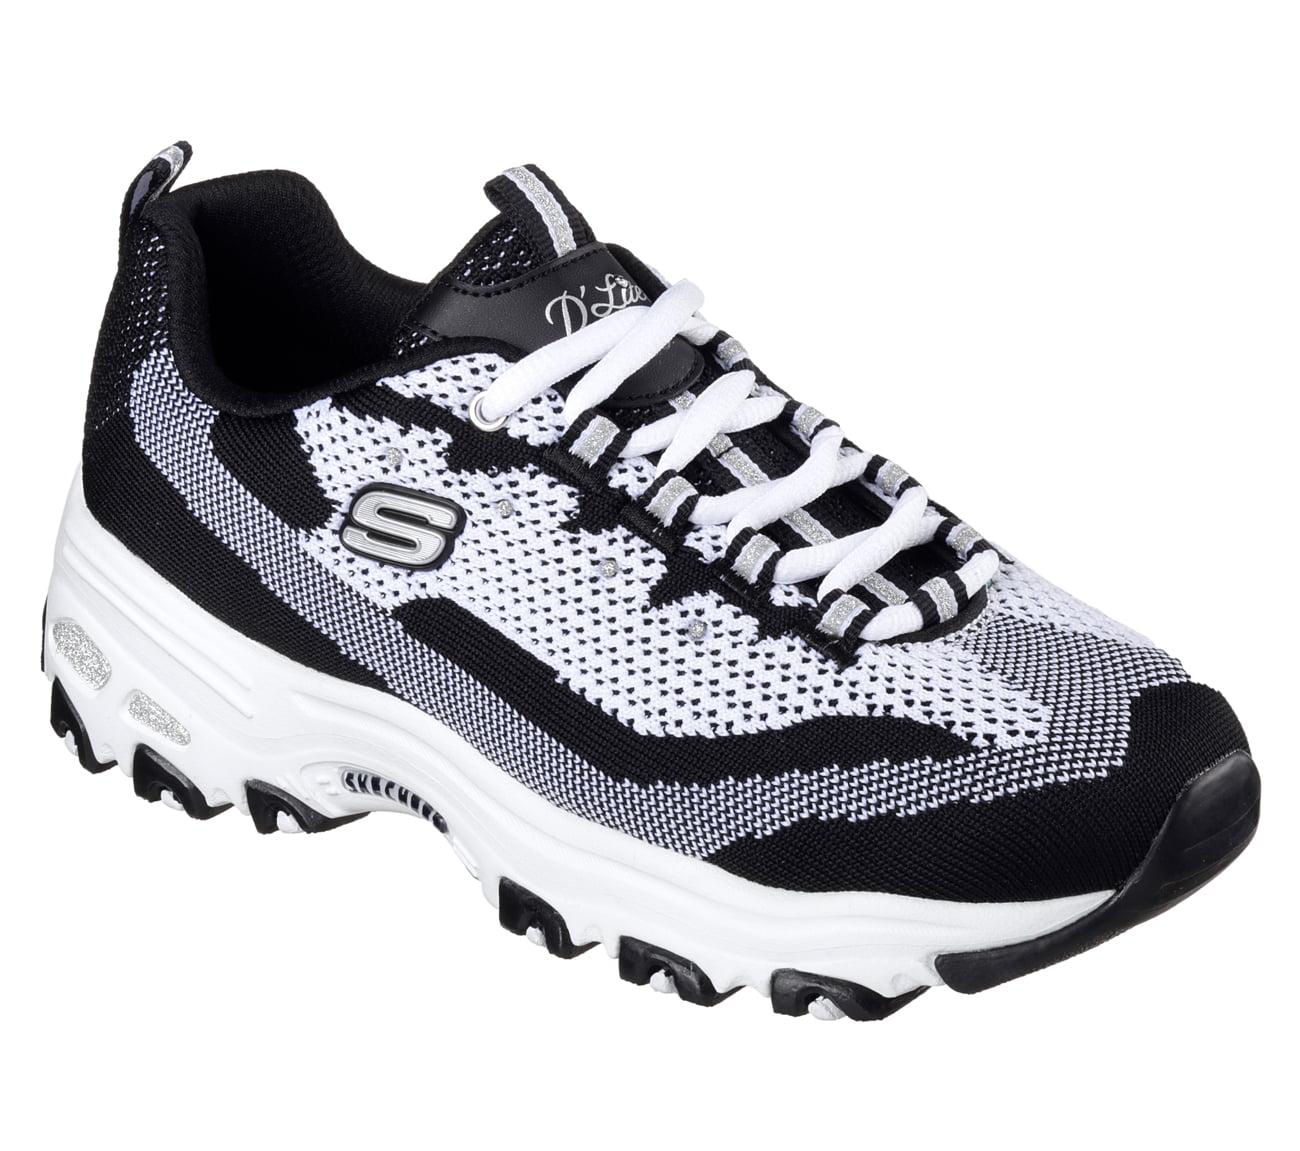 Skechers D'LITES 11955BKW Women's D'LITES Skechers - REINVENTION Casual Shoes c3bf92